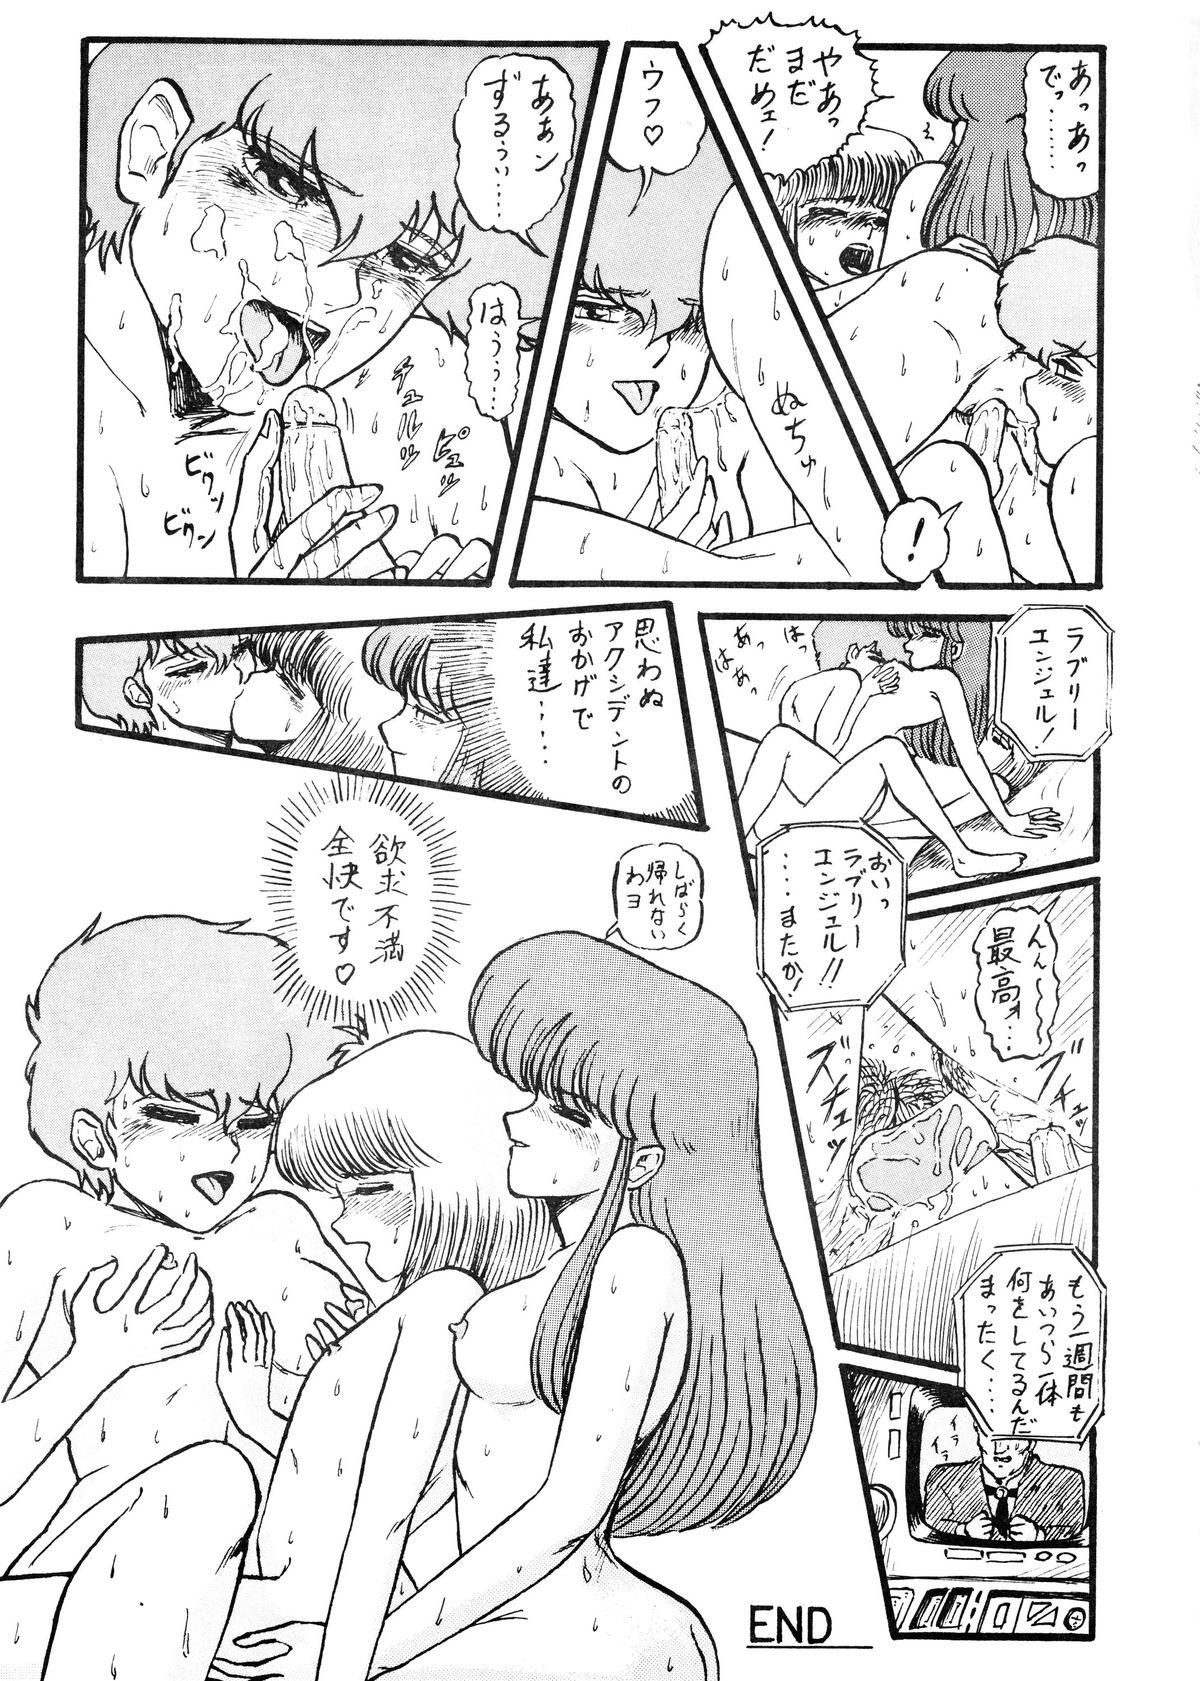 [Secret Society Chi (Iijima Mario)] Kai II - Iijima Mario Kojin-shi - (Various) 43